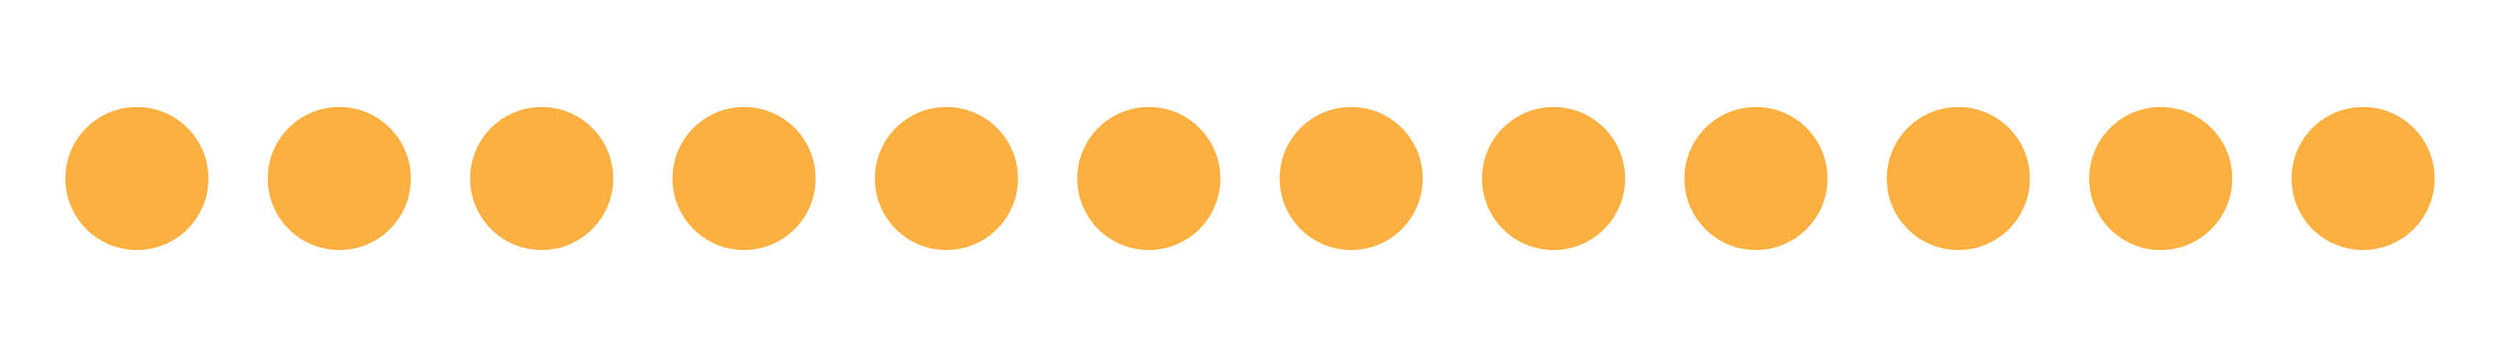 White dots.jpg